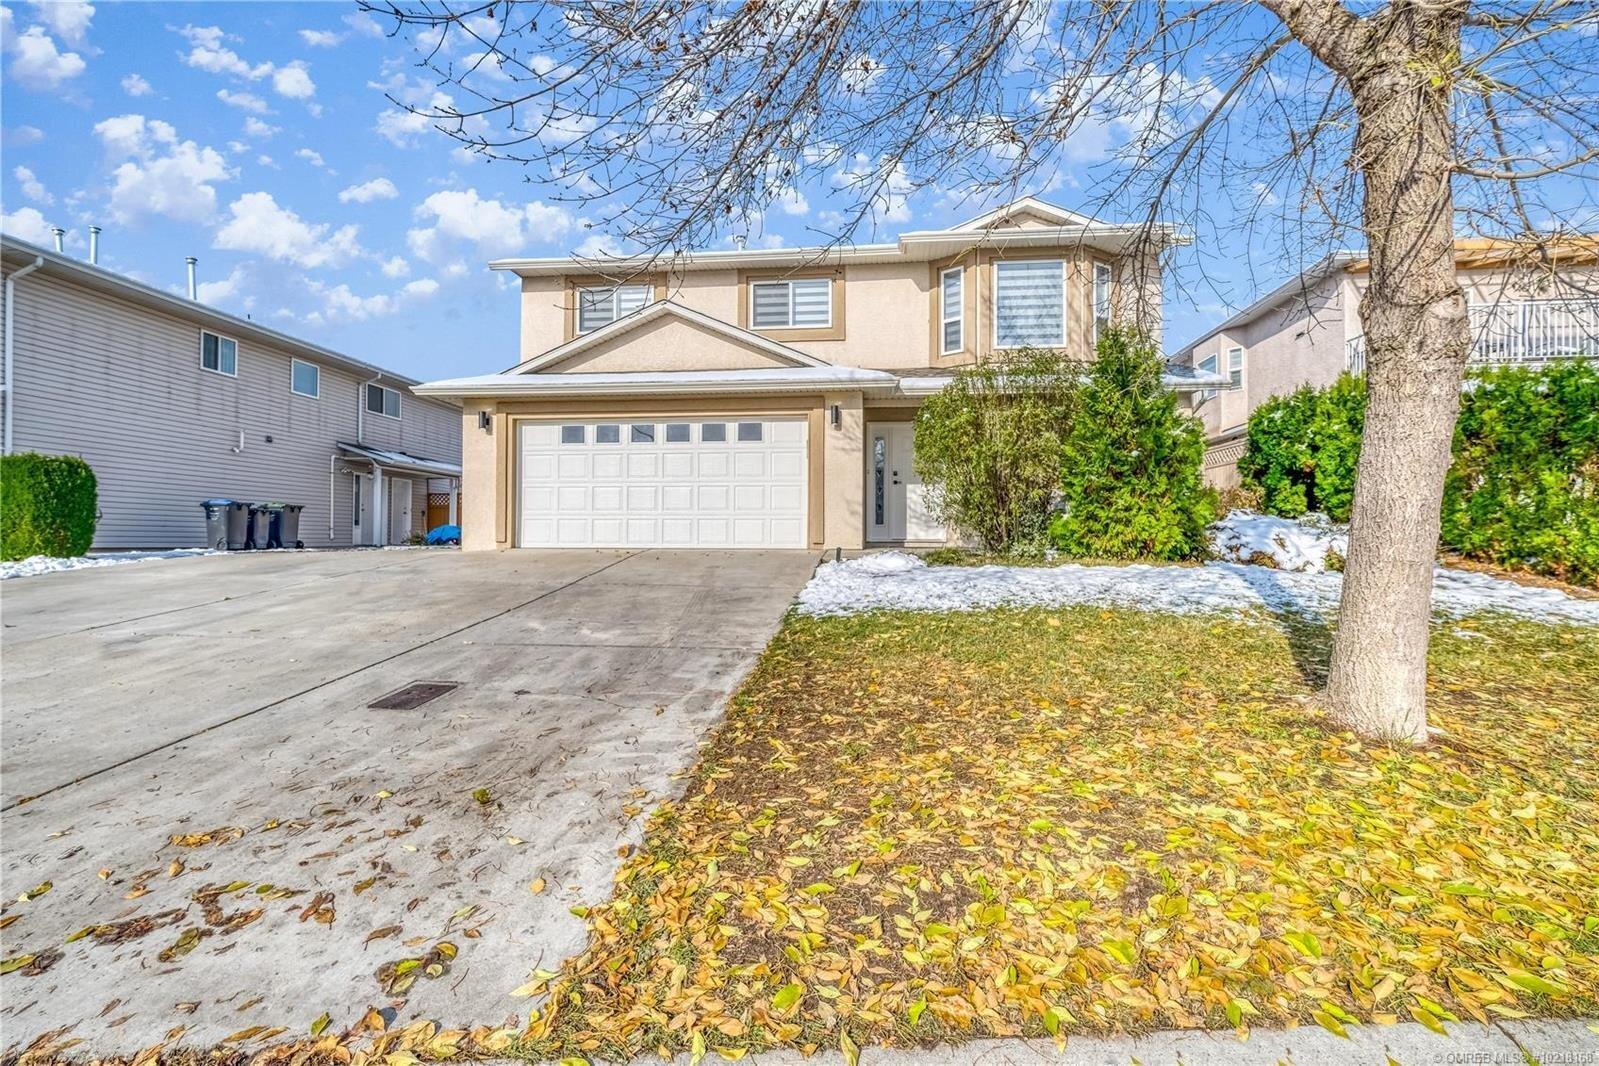 House for sale at 420 Wigglesworth Cres Kelowna British Columbia - MLS: 10218168